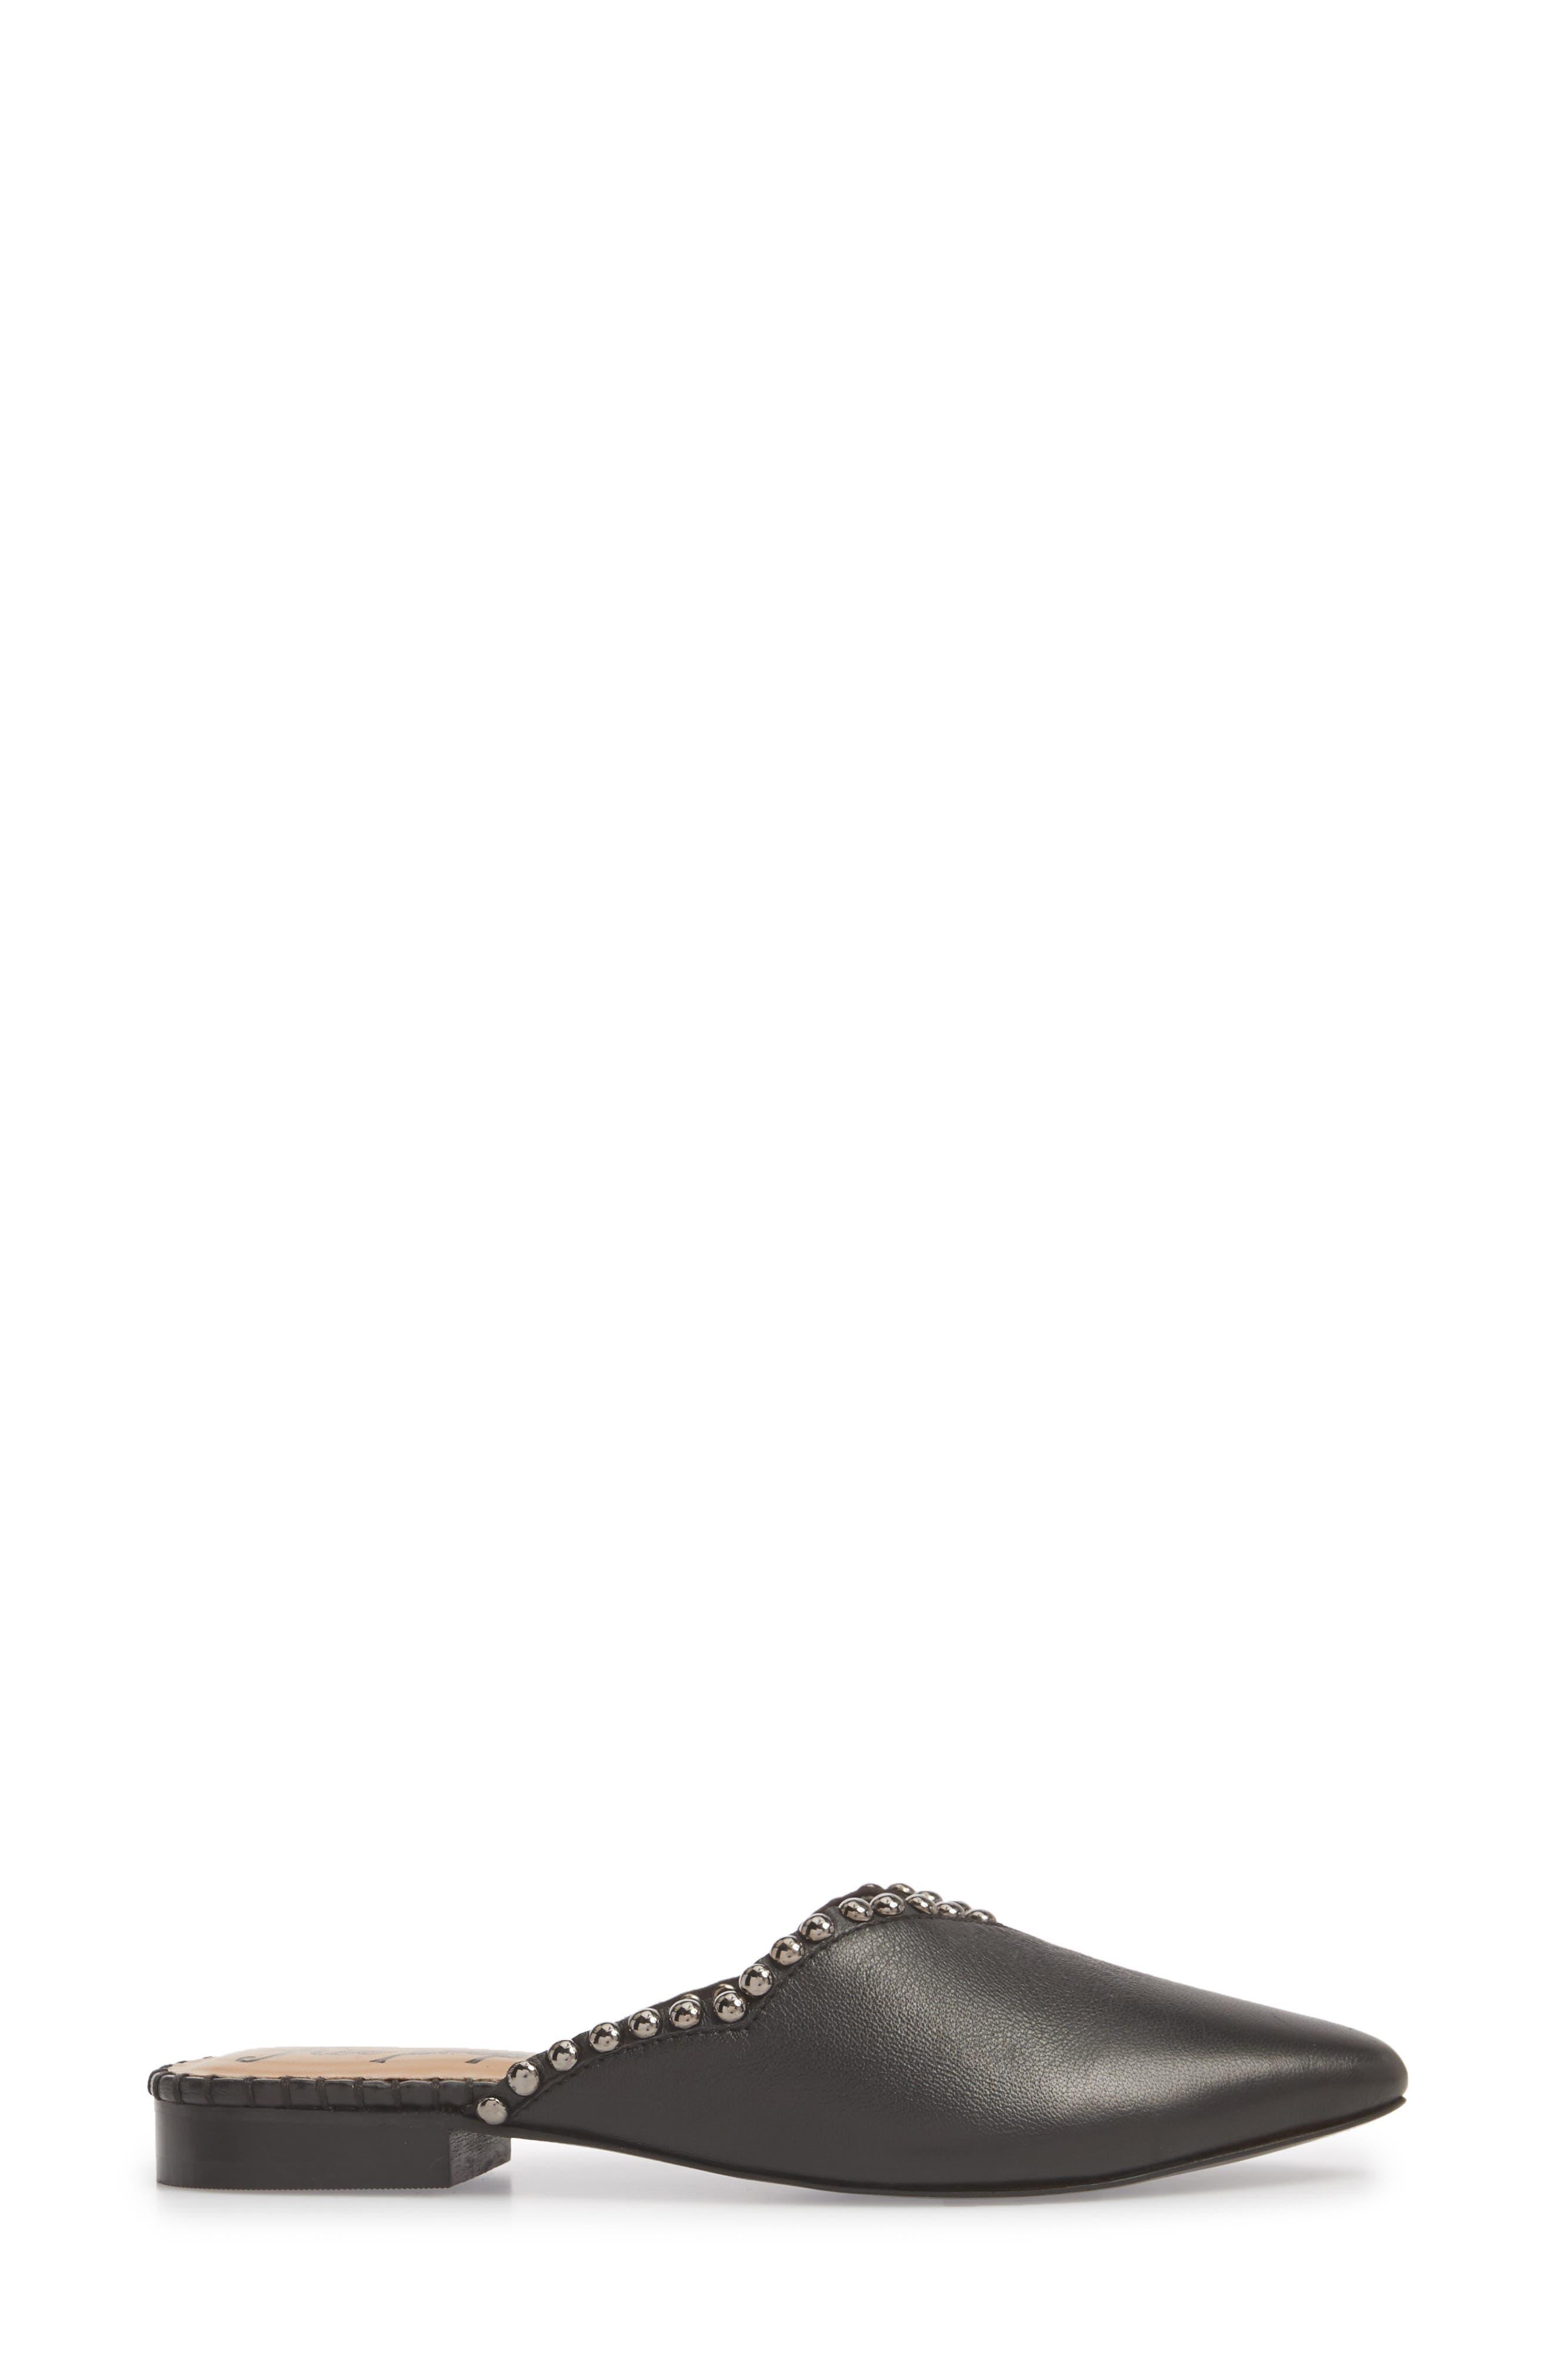 Newport Studded Mule,                             Alternate thumbnail 5, color,                             Black